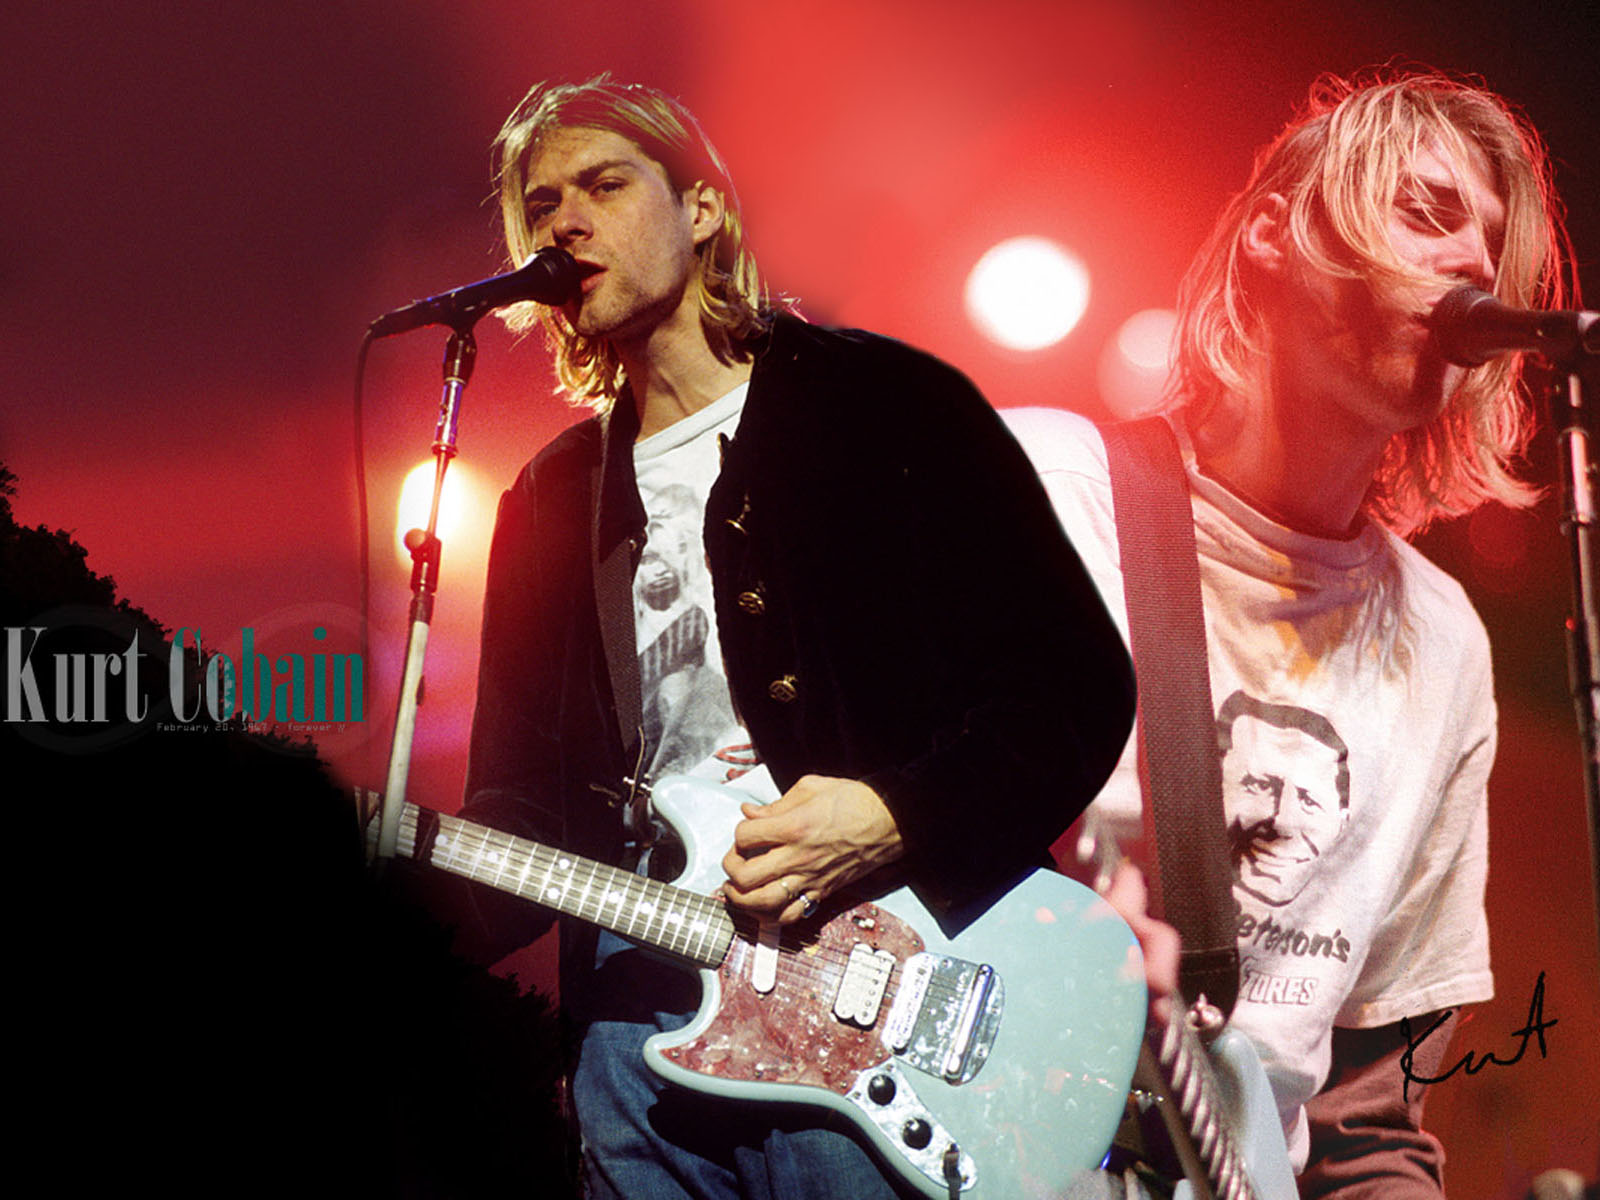 Kurt Cobain HD WallpapersKurt Cobain Wallpapers Pictures 1600x1200